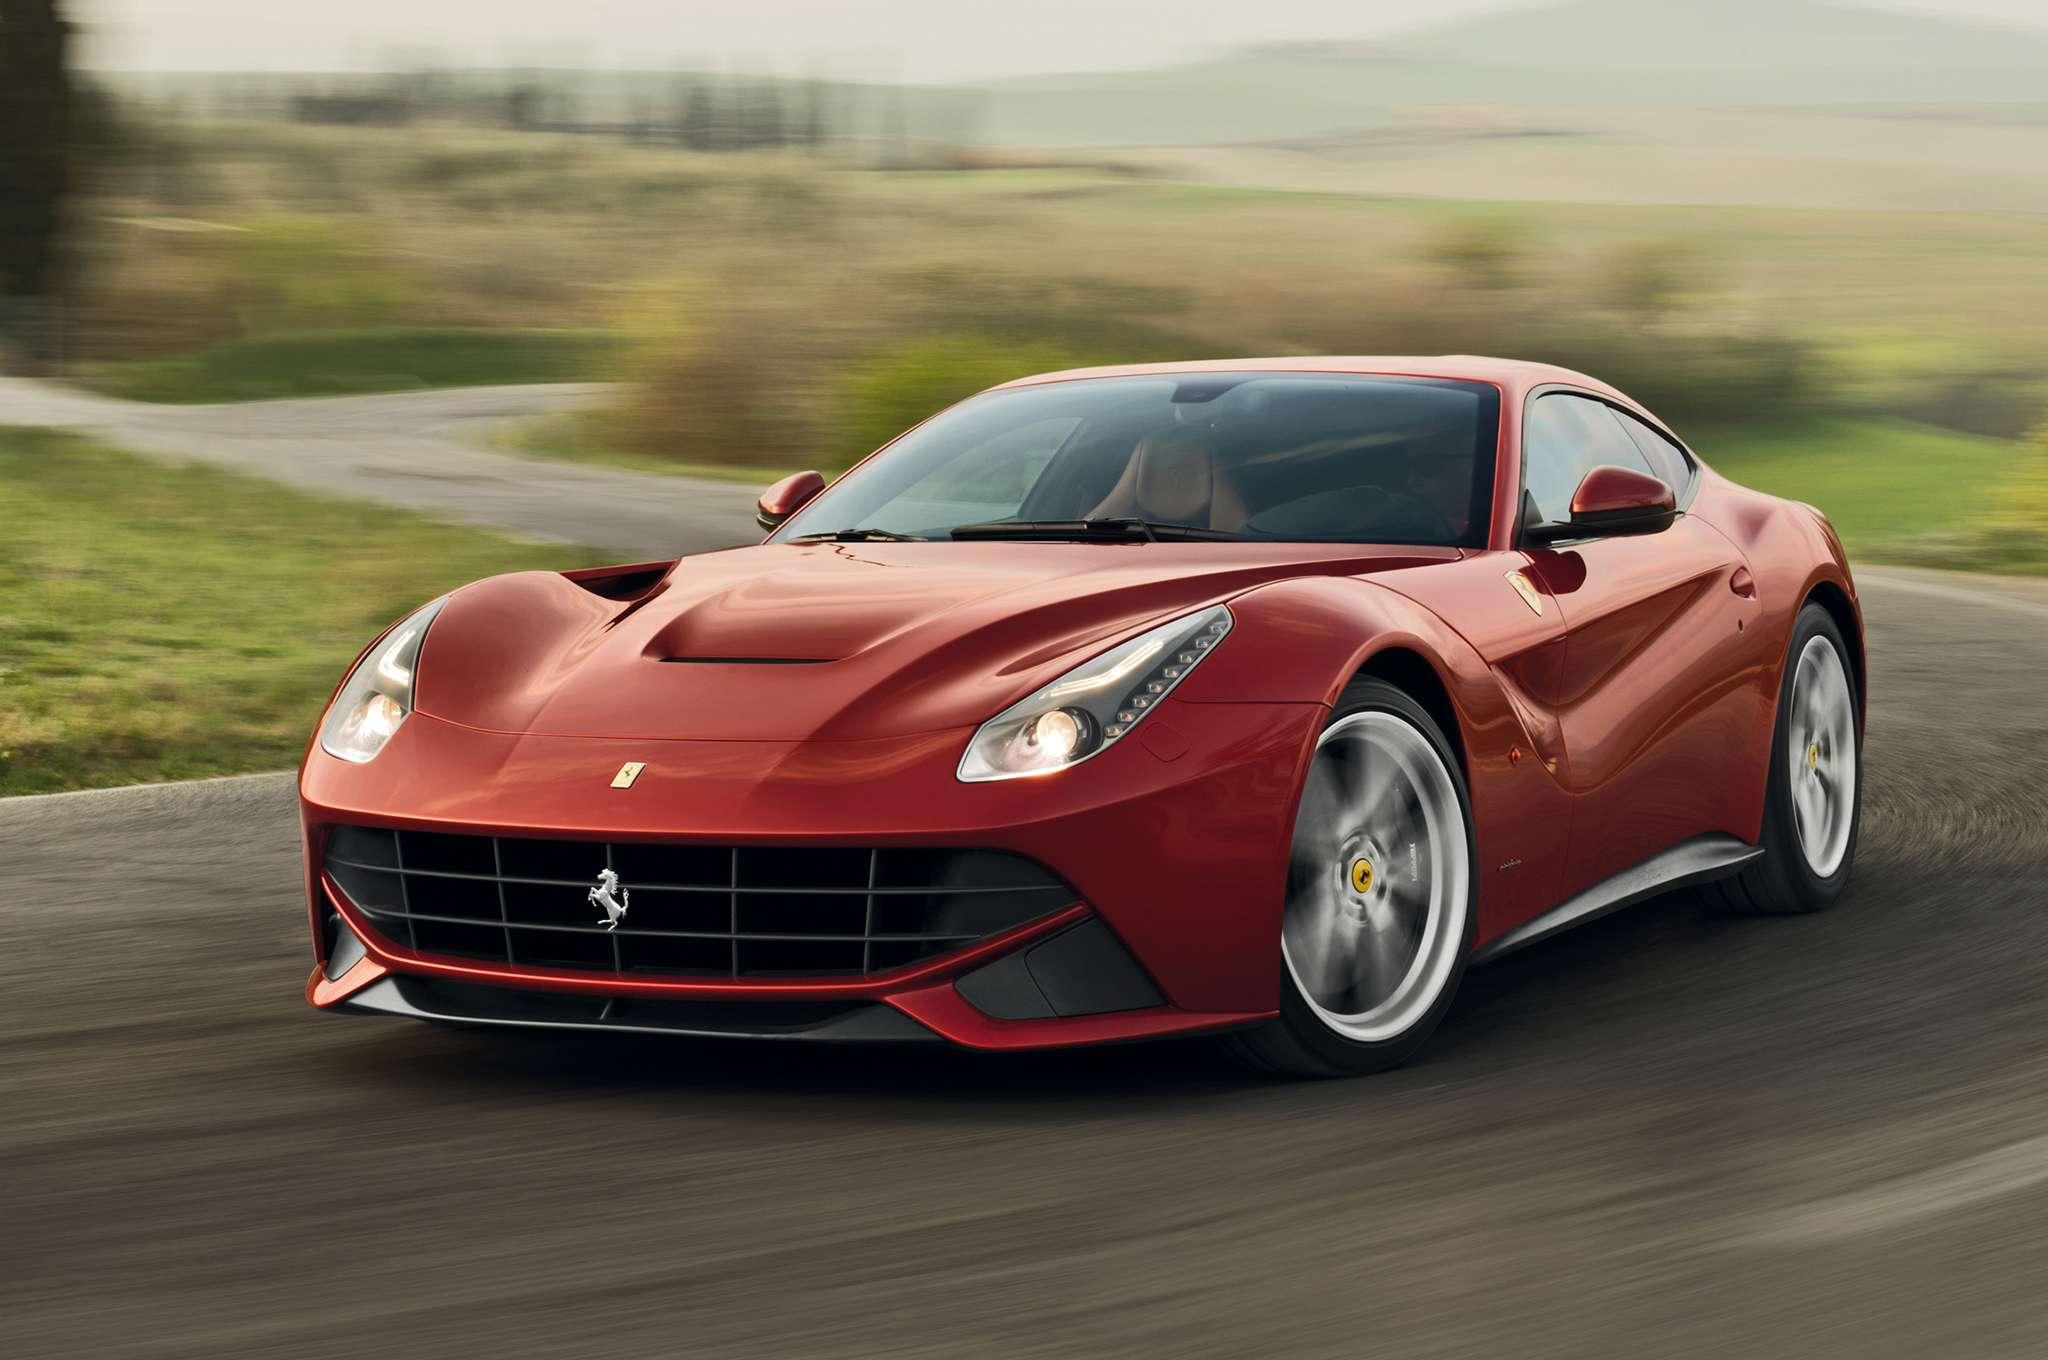 10 Ferrari de $3.2 millones en US por sus 60 años Foto: Ferrari